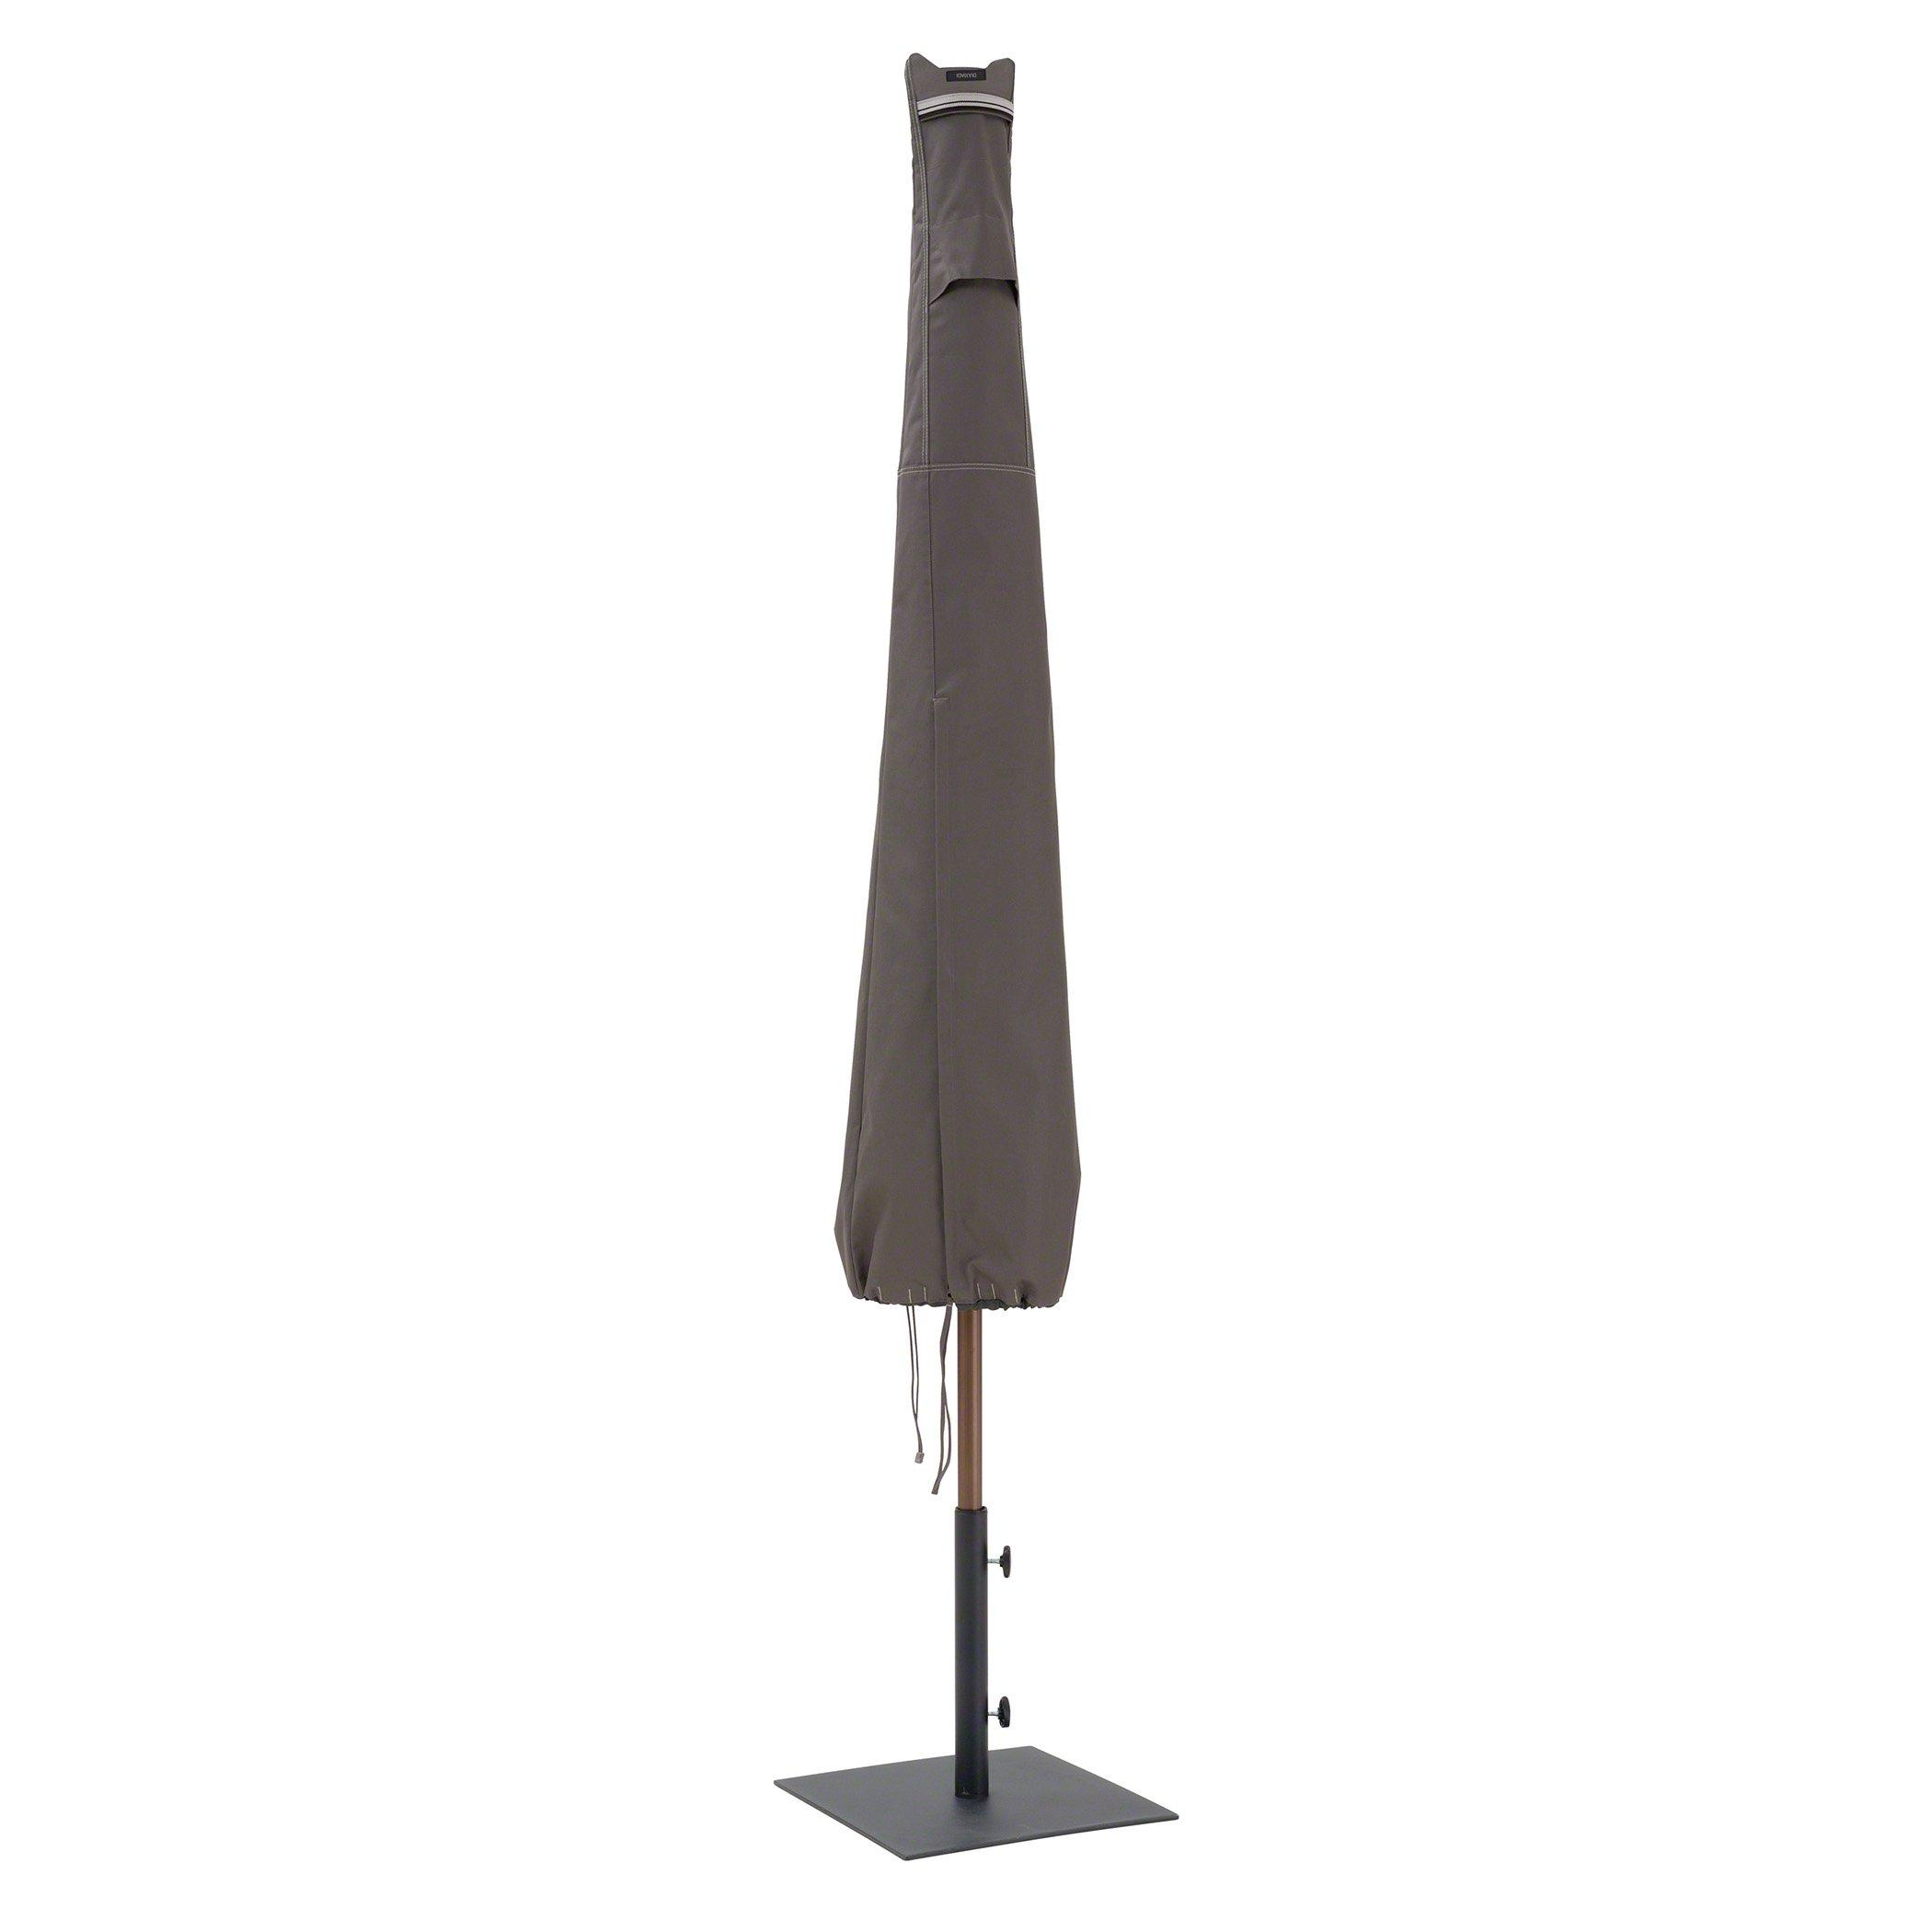 Classic Accessories Ravenna Umbrella Cover For Hampton Bay 9' Aluminum Patio Umbrellas by Classic Accessories